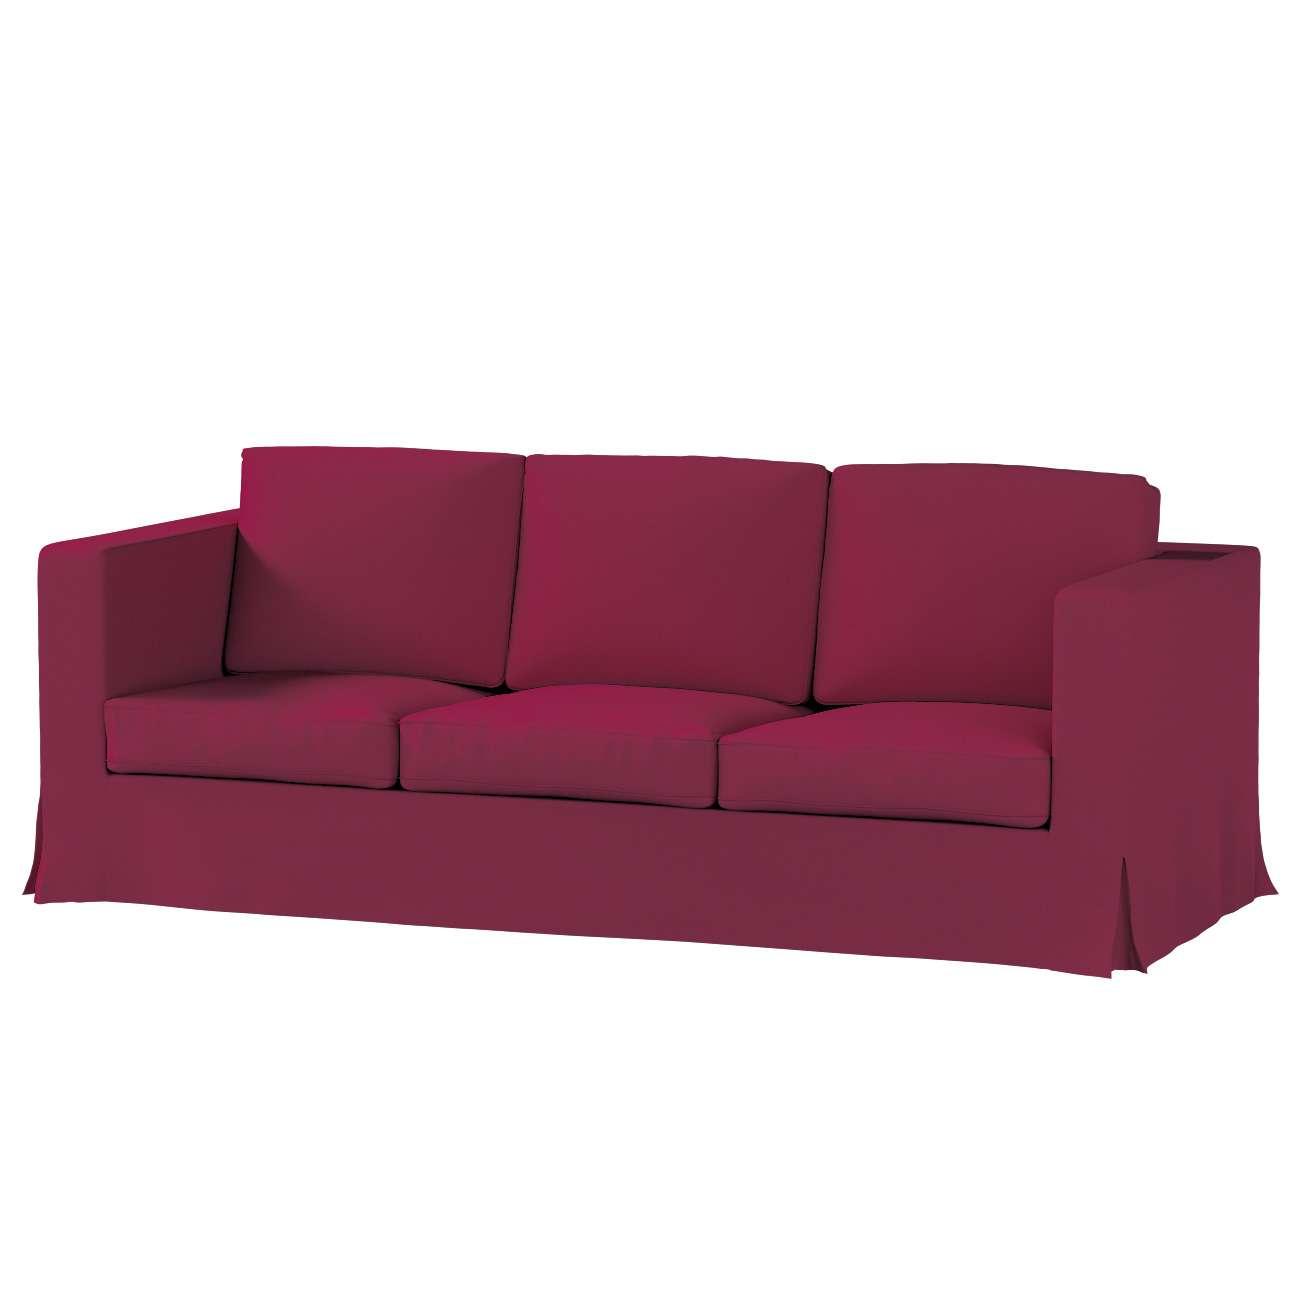 Karlanda klädsel 3-sits soffa - lång i kollektionen Panama Cotton, Tyg: 702-32